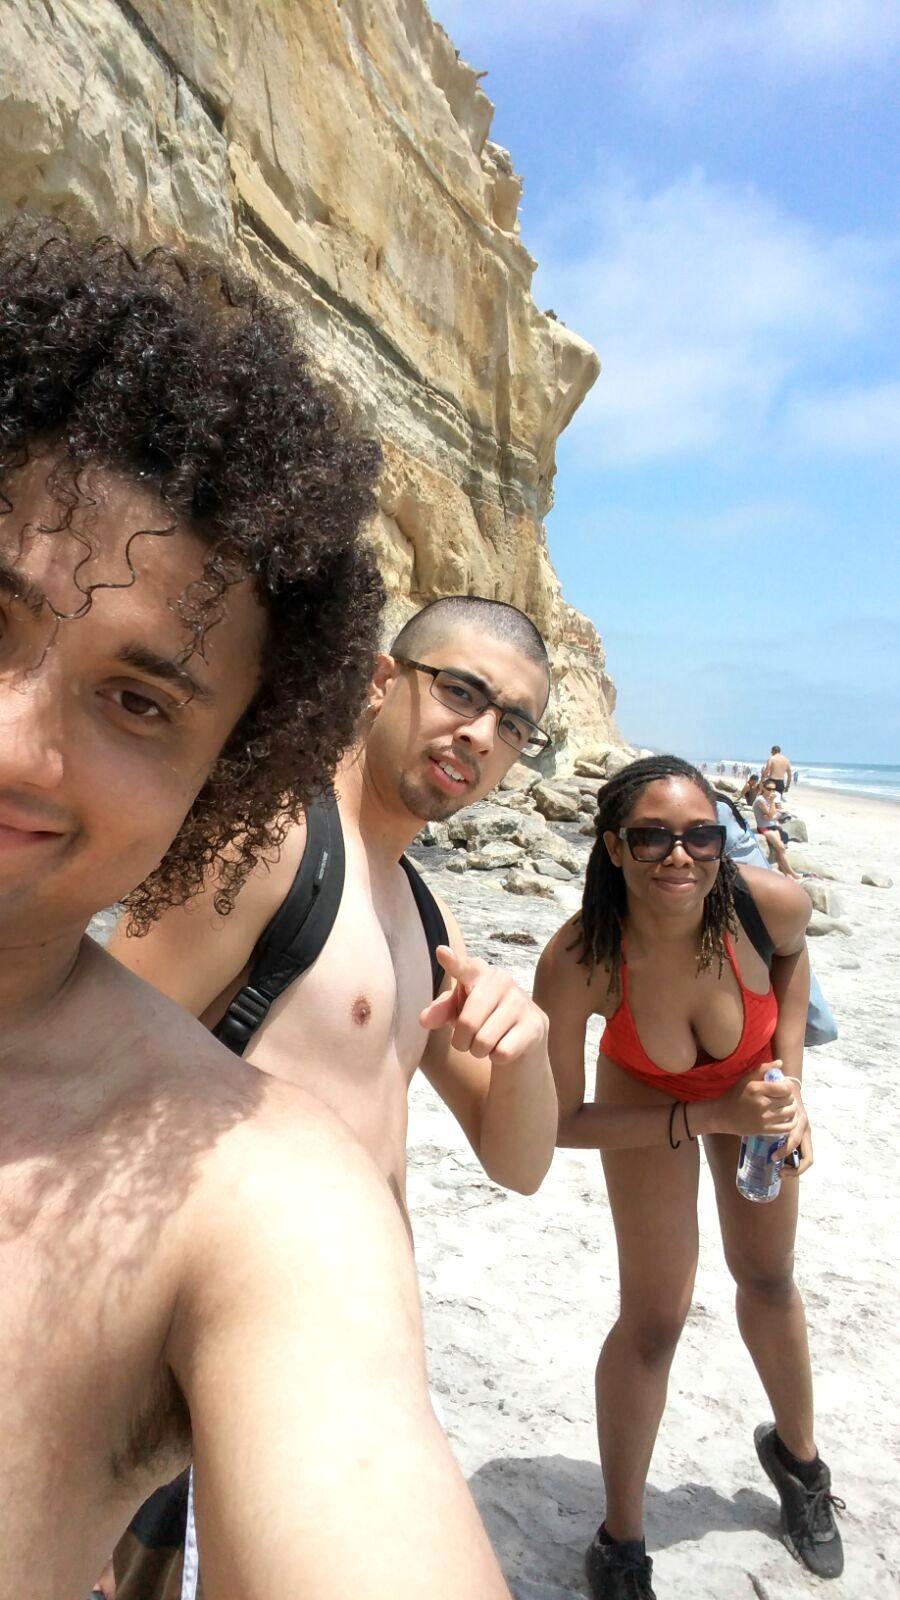 T3 Torrey Pines Beach Tristan Obryan Ericson Quero Alexis Chateau.jpg